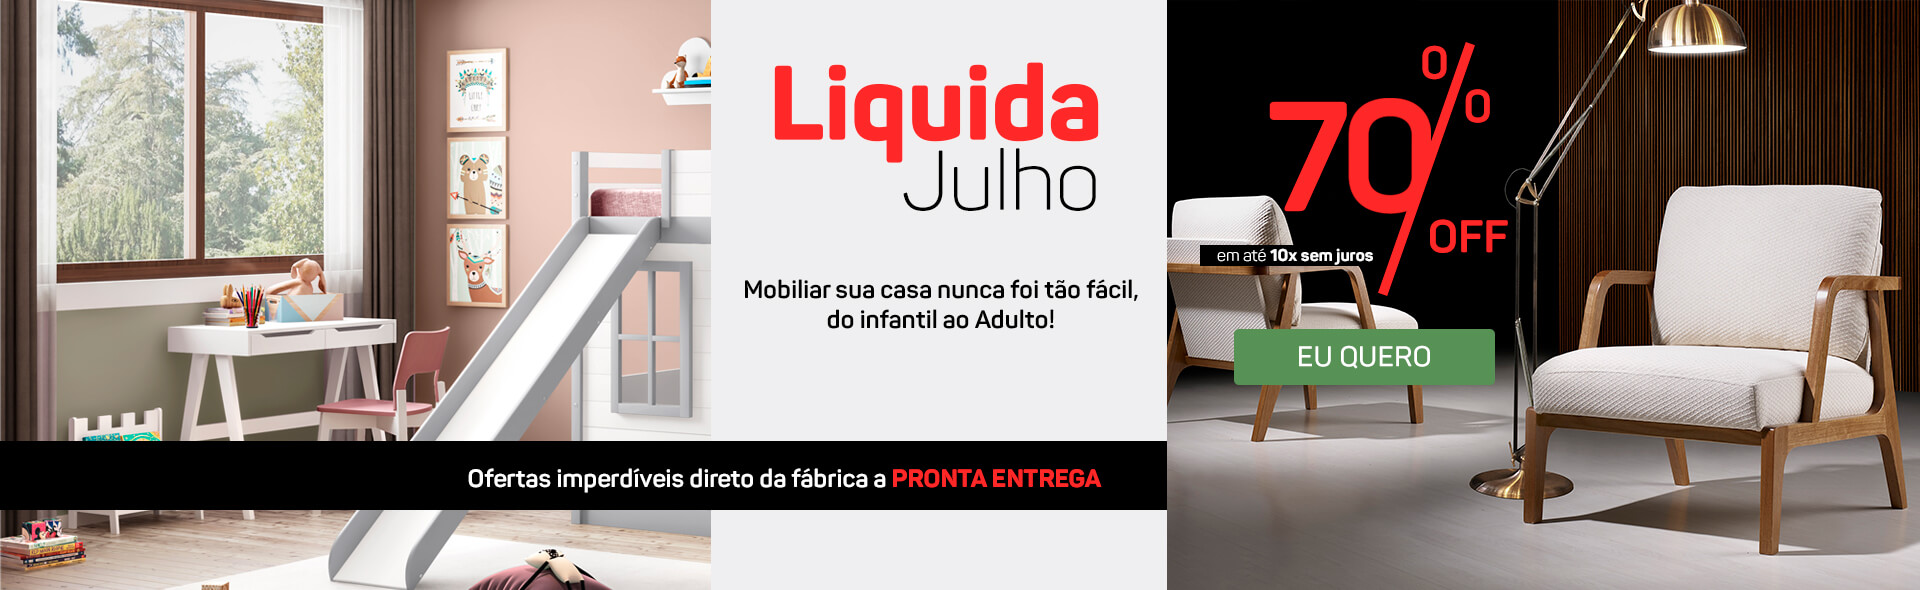 01 Liquida Julho